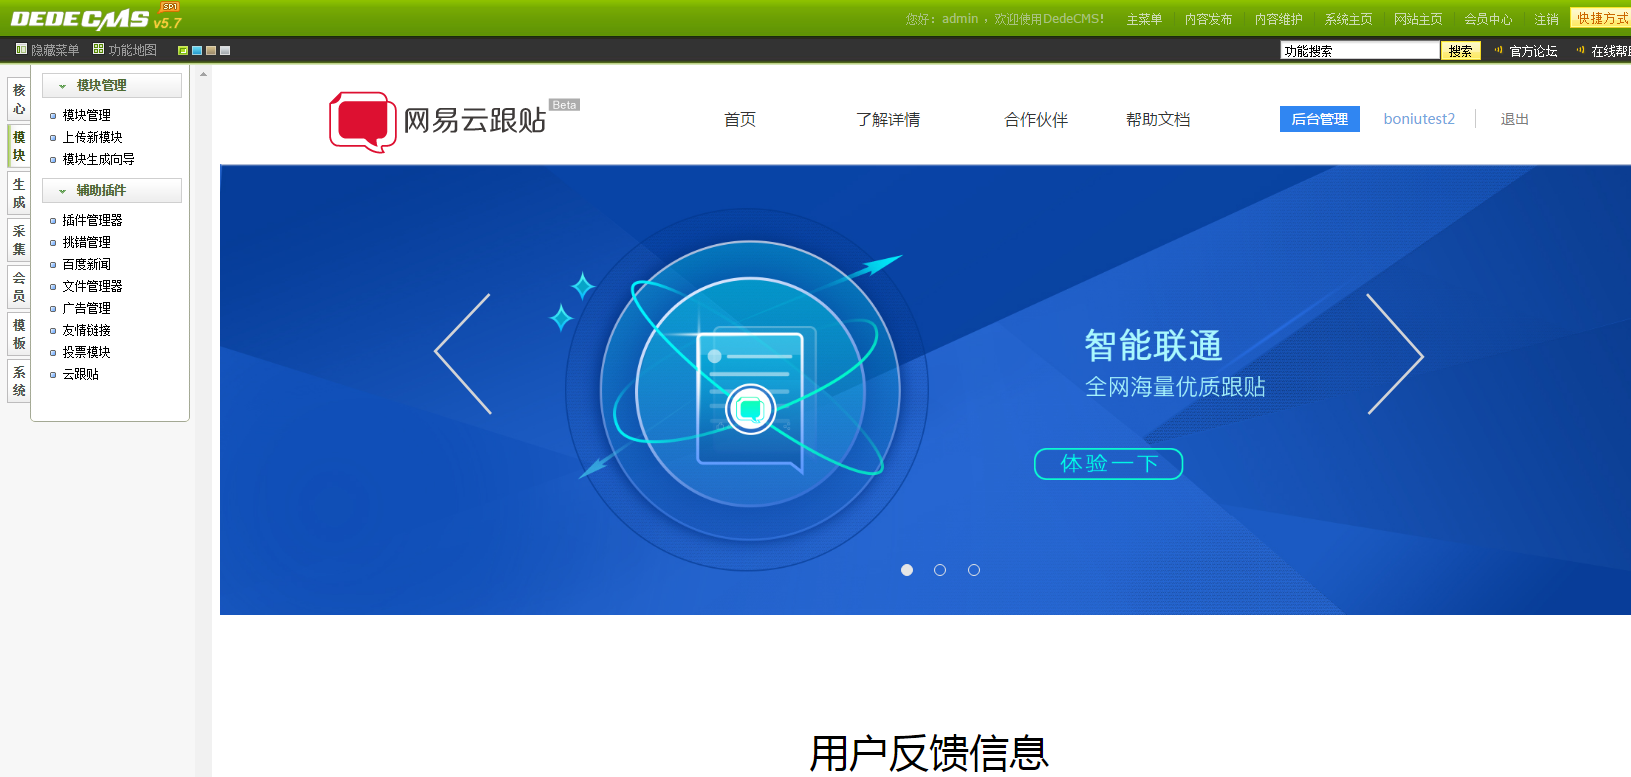 Dedecms网易云跟帖插件安装教程